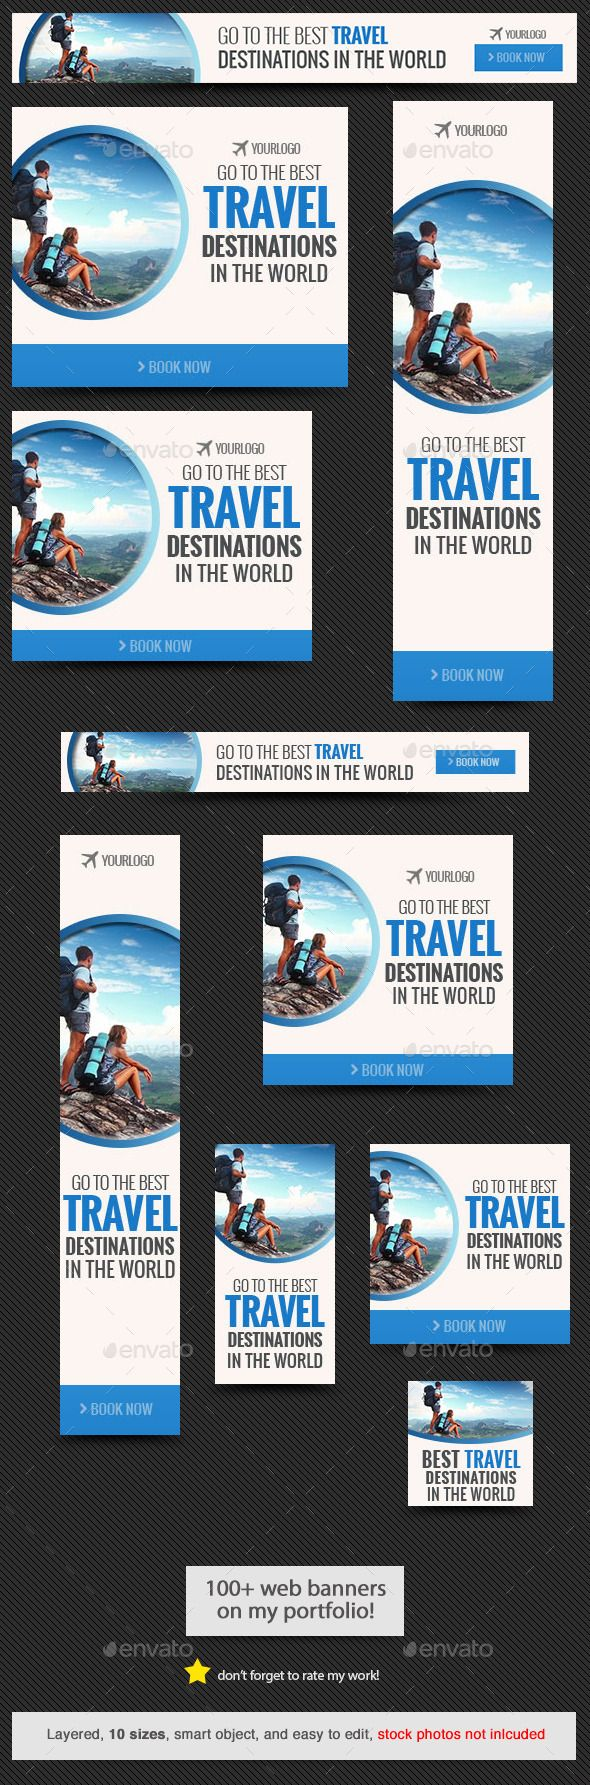 Best Travel Destination Web Banner Template #design Download: http://graphicriver.net/item/best-travel-destination-web-banner-template/11709017?ref=ksioks